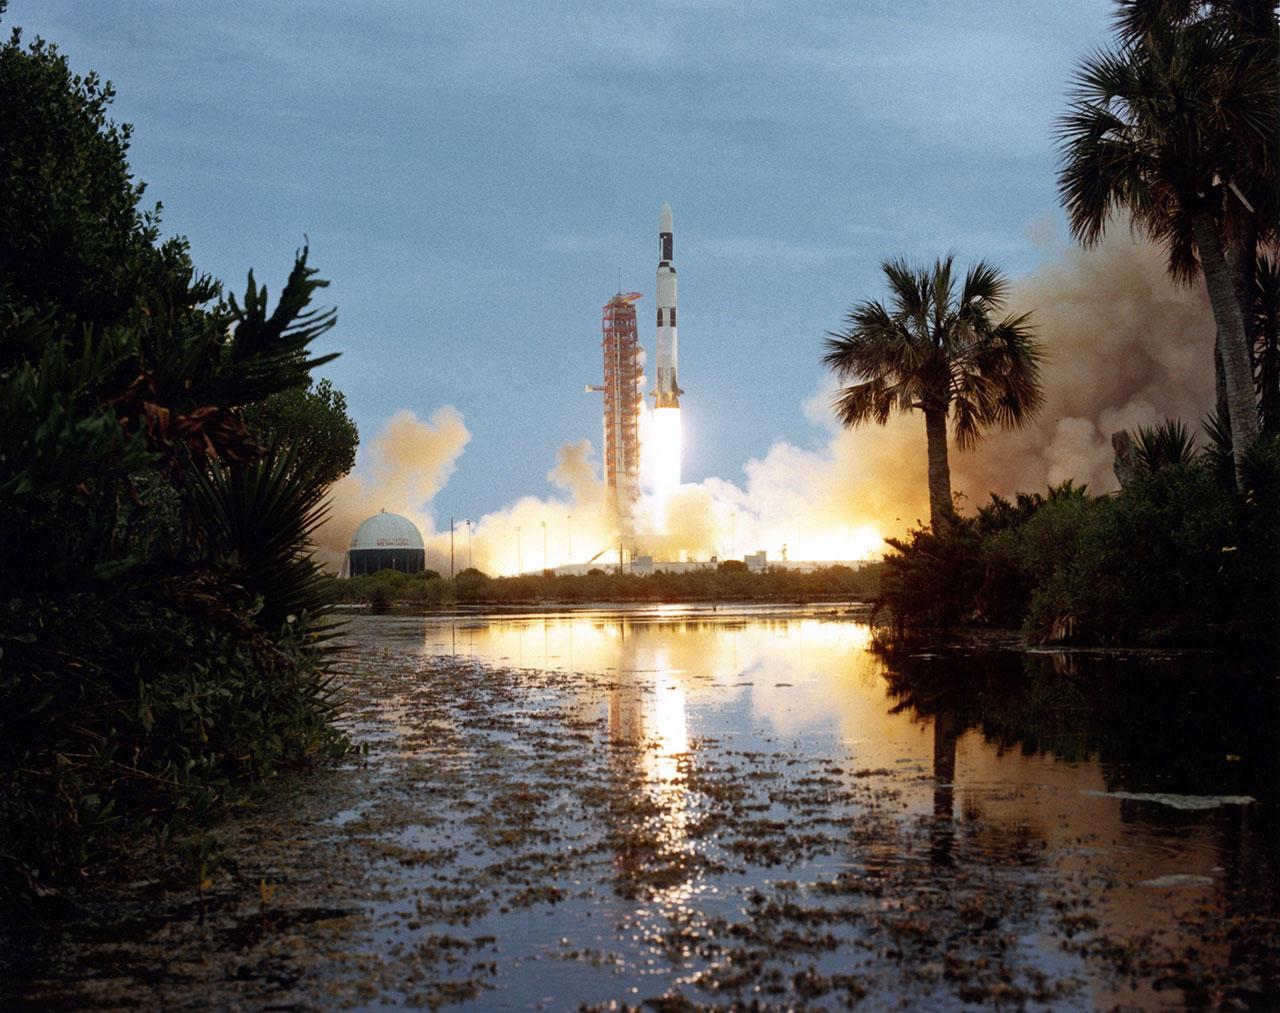 The Last Saturn V